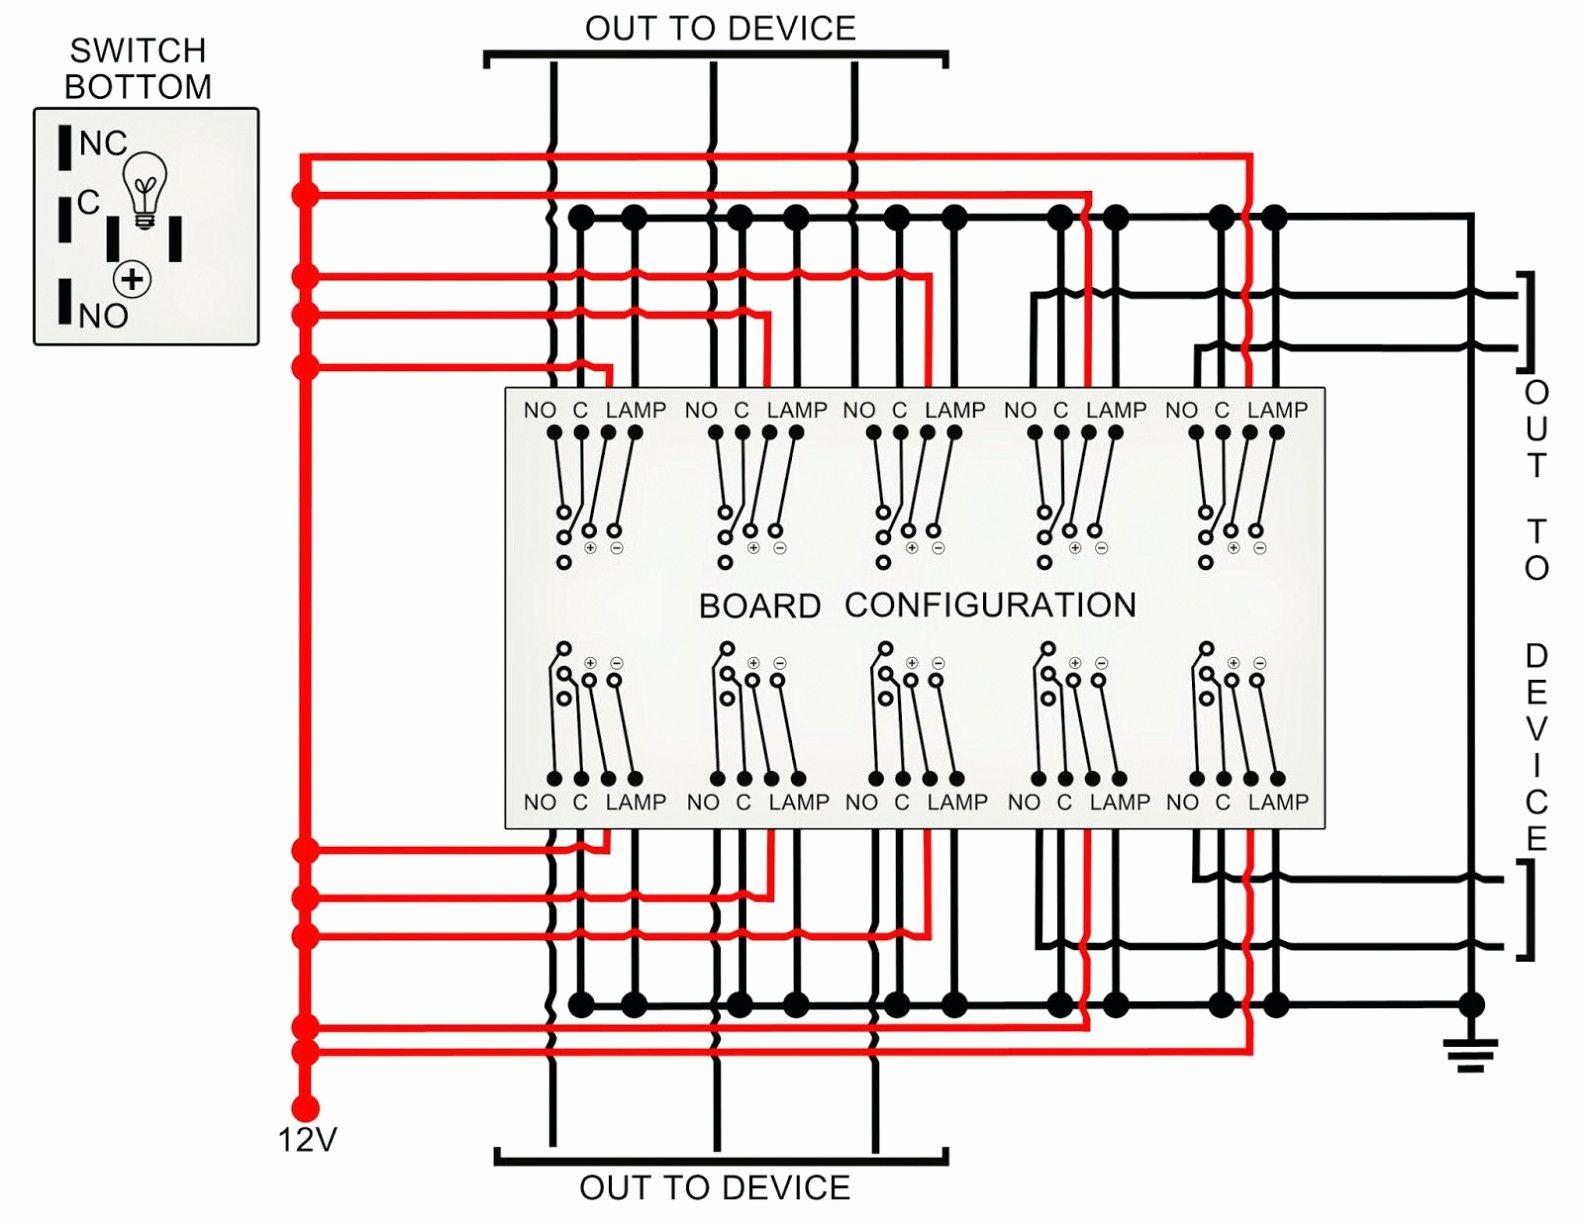 Rocker Switch Wiring Diagram Va | Wiring Diagram - Lighted Rocker Switch Wiring Diagram 120V